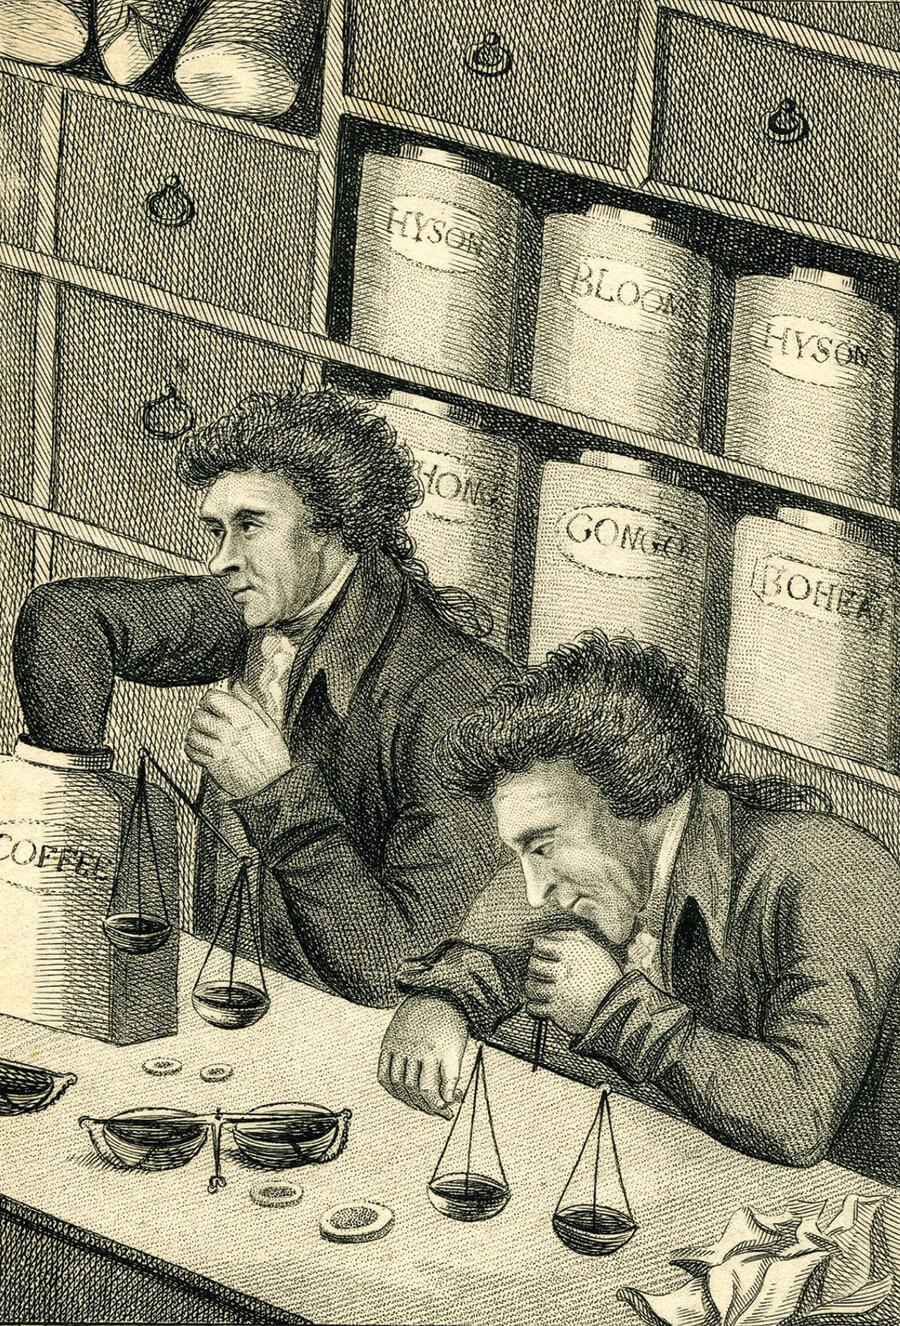 Men weighing coffee beans